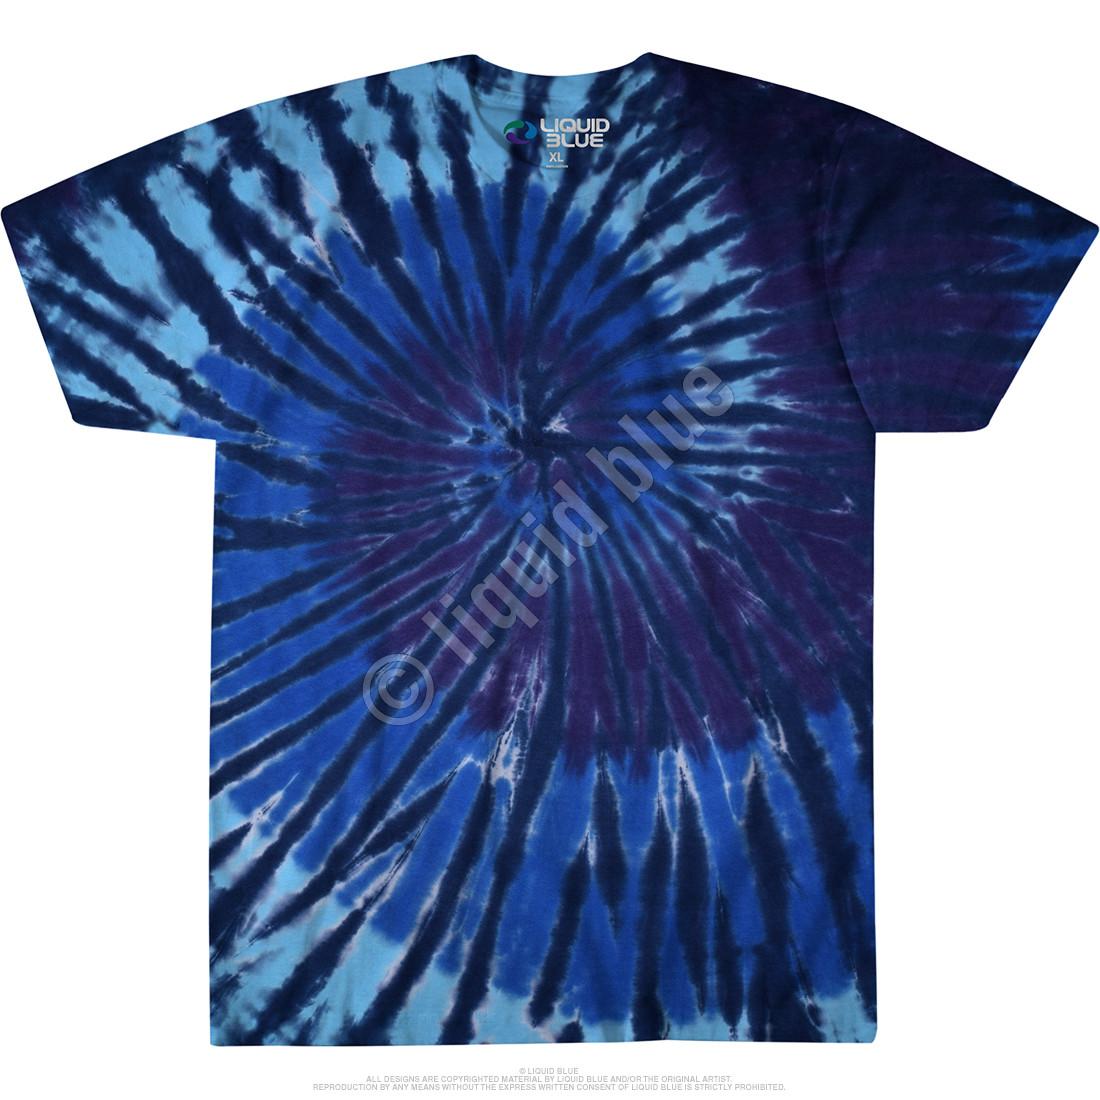 Blue Spiral Streak Unprinted Tie-Dye T-Shirt